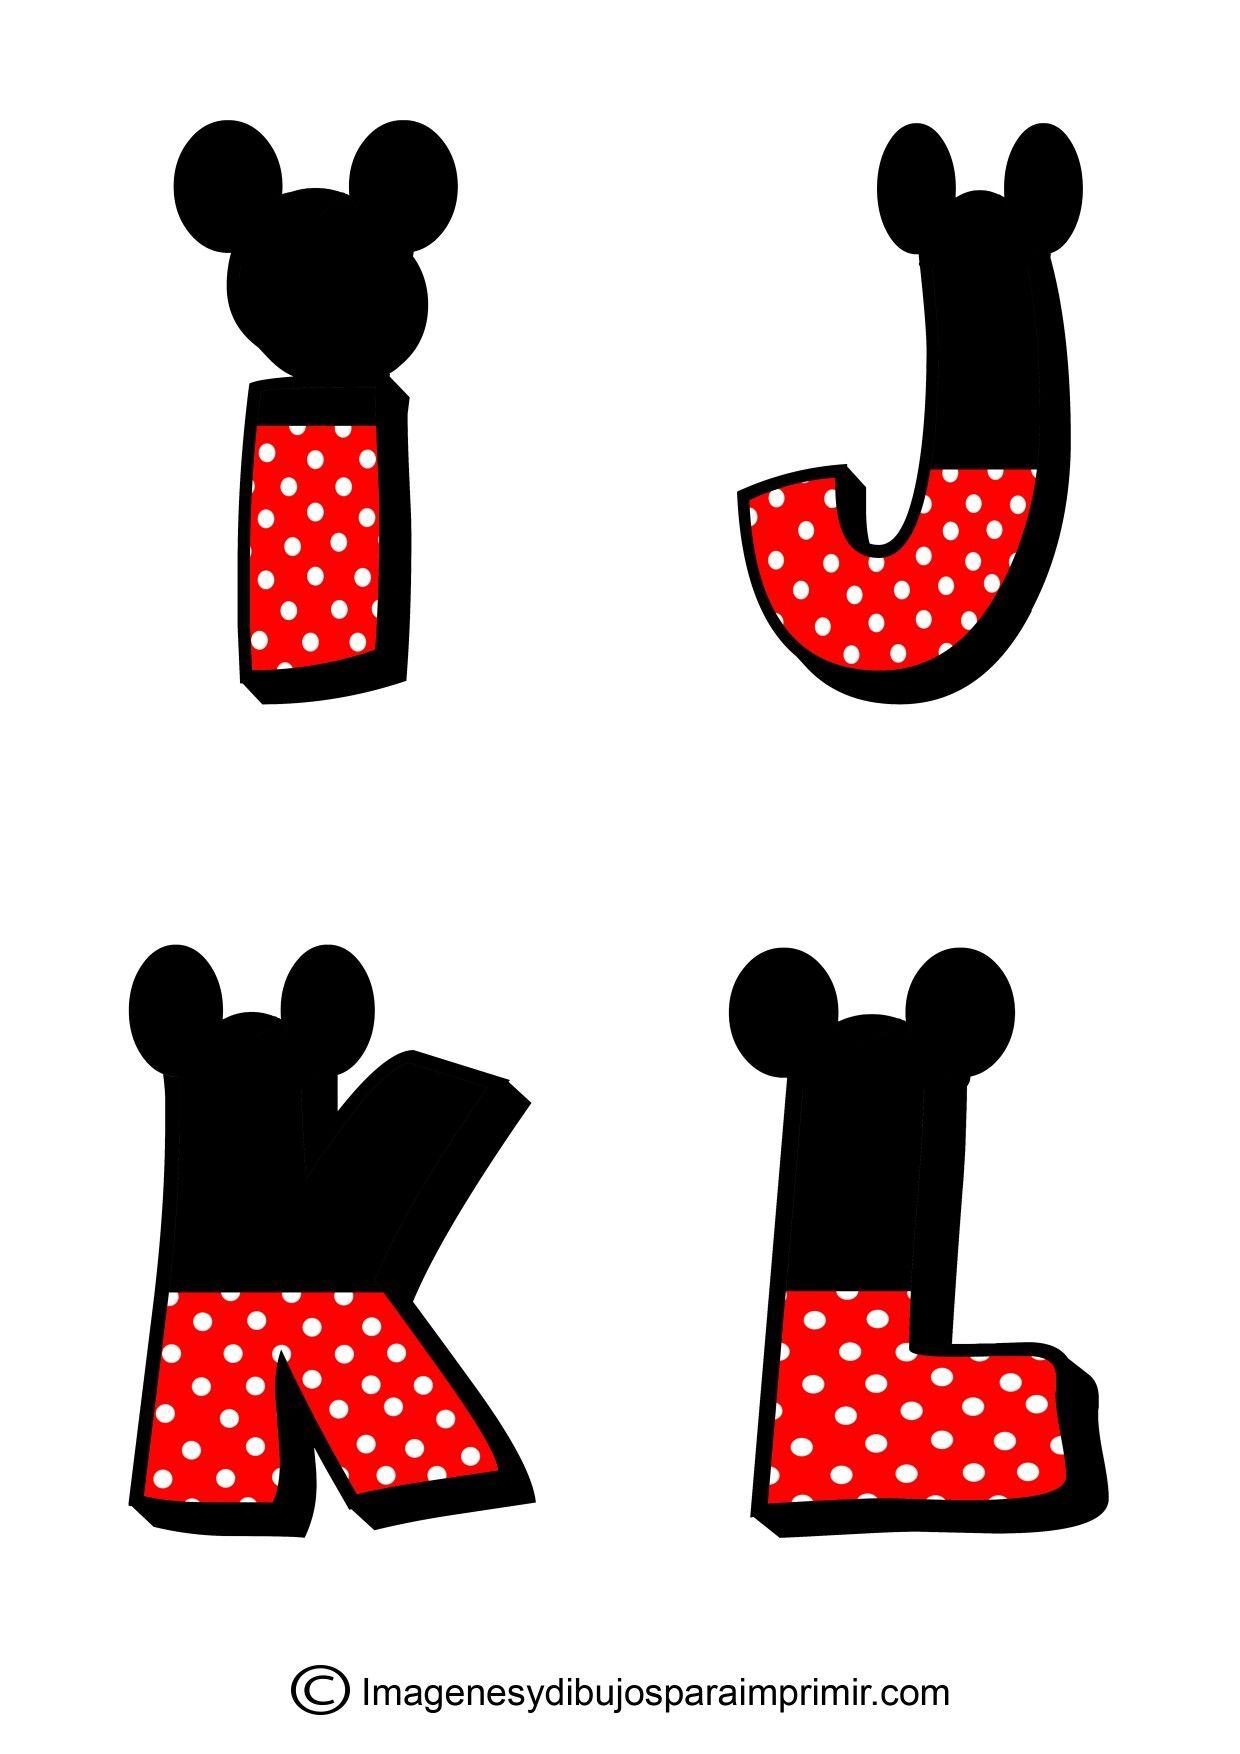 Pin de Floricel Lopéz en mickey | Pinterest | Mickey mouse letters ...